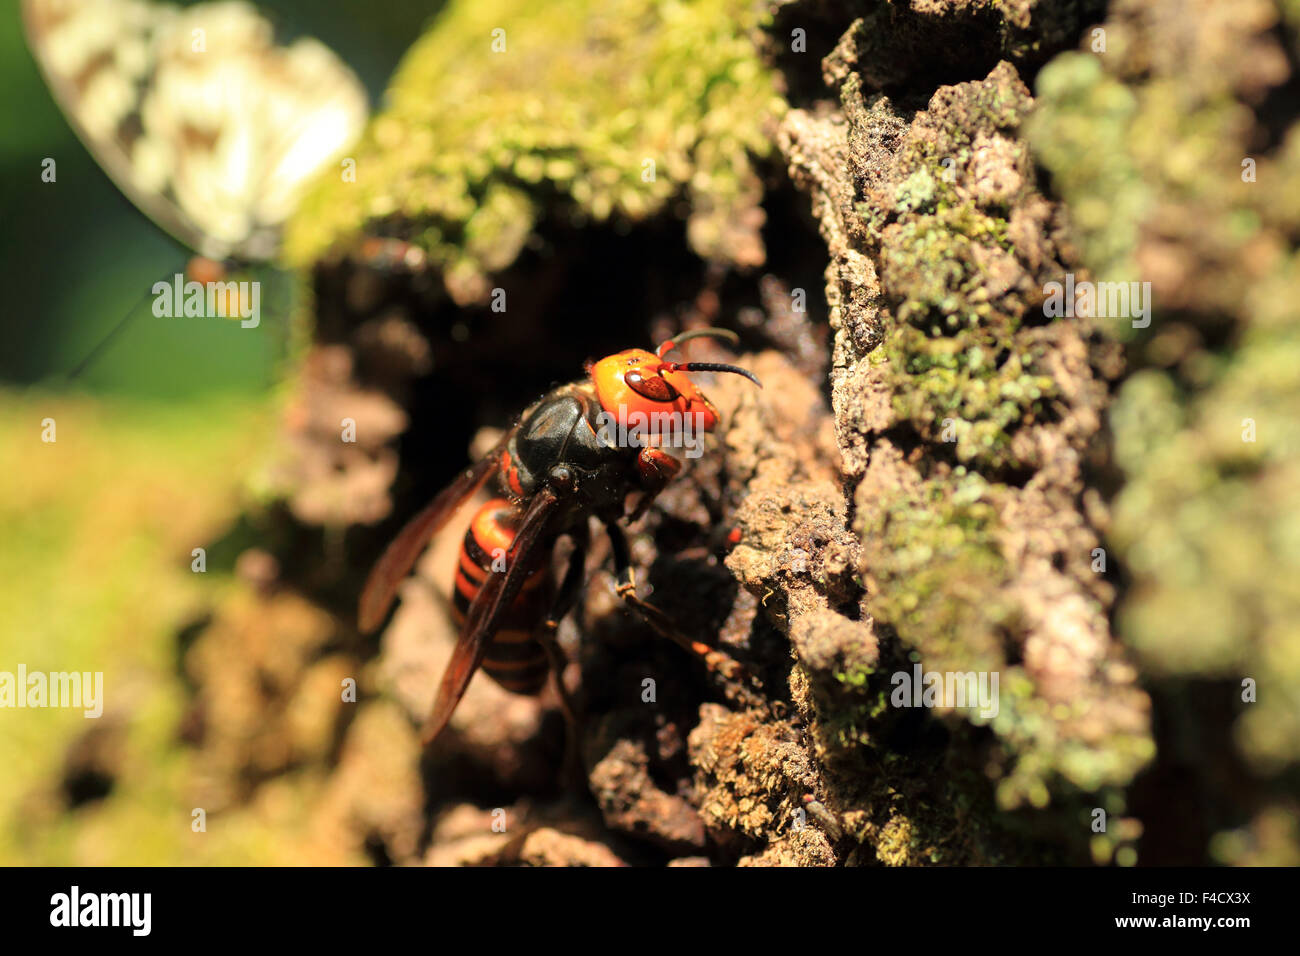 Japanese giant hornet (Vespa mandarinia) in Japan Stock Photo